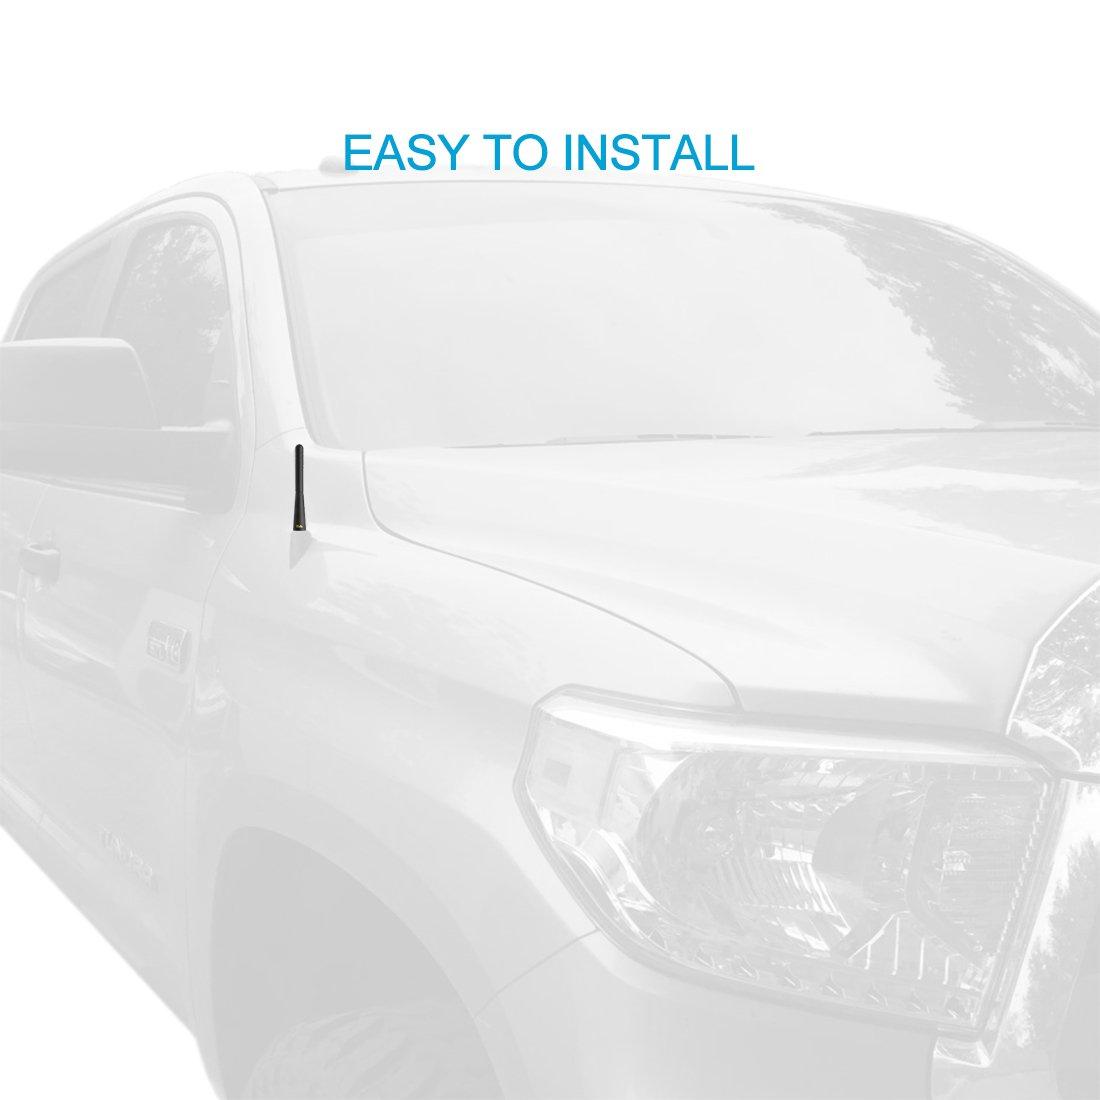 Toyota Sienna Service Manual: Internal Control Module Random Access Memory(RAM) Error